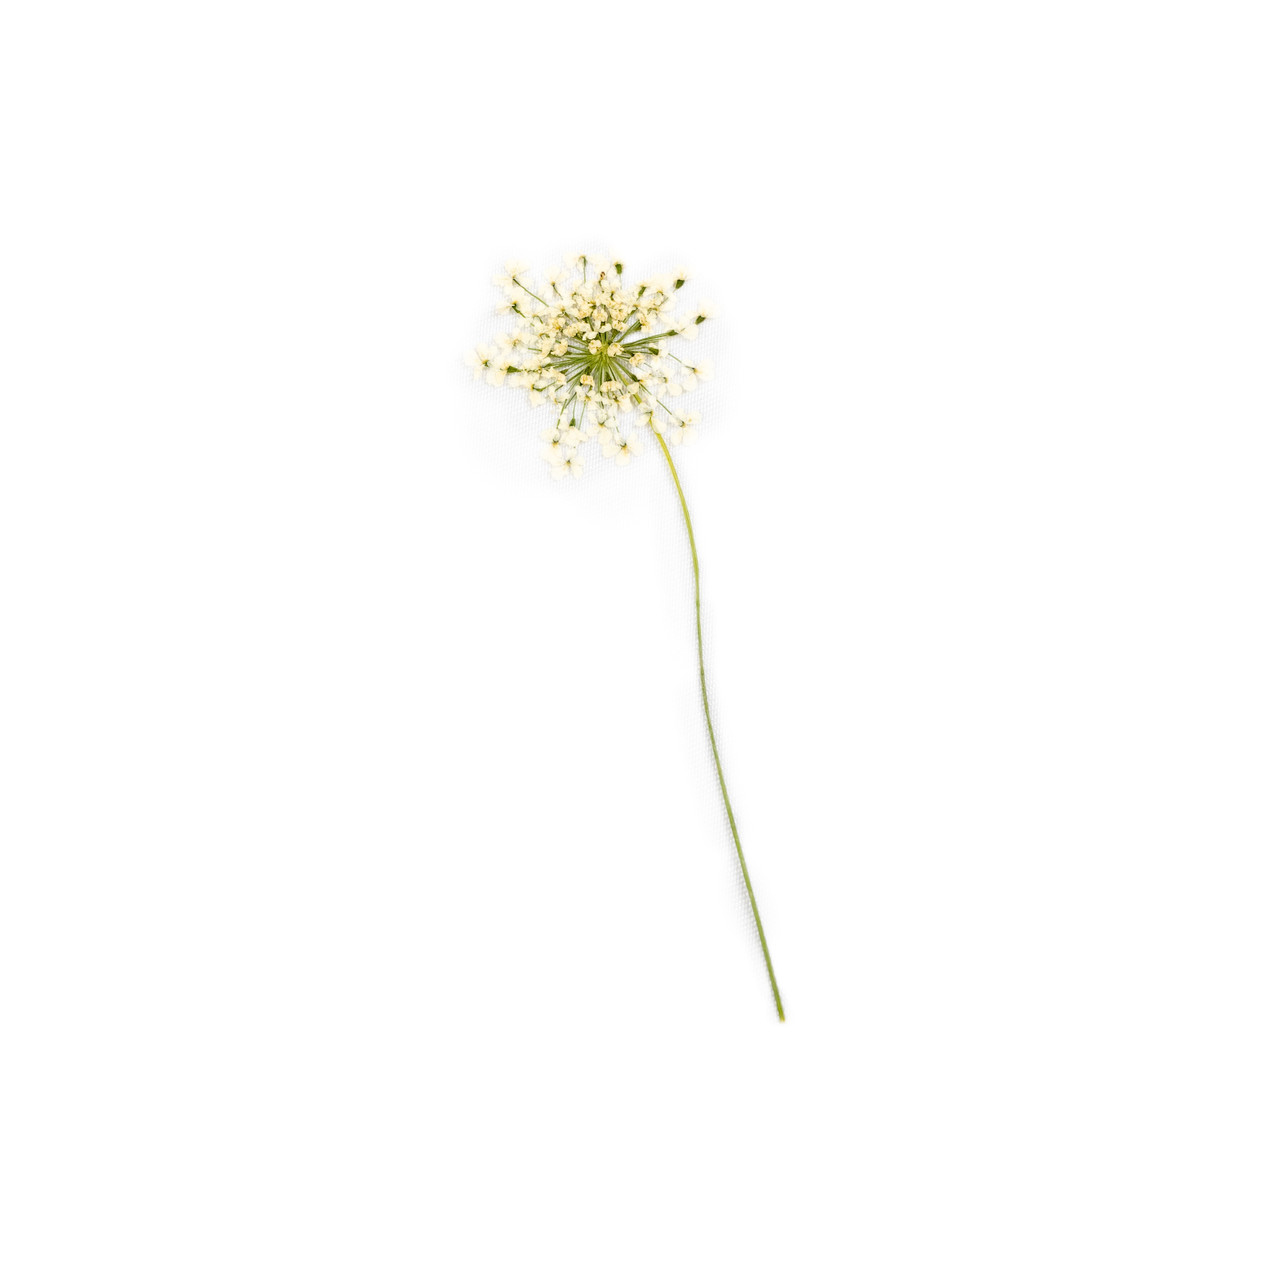 Pressed Botanical - White Lace Flower